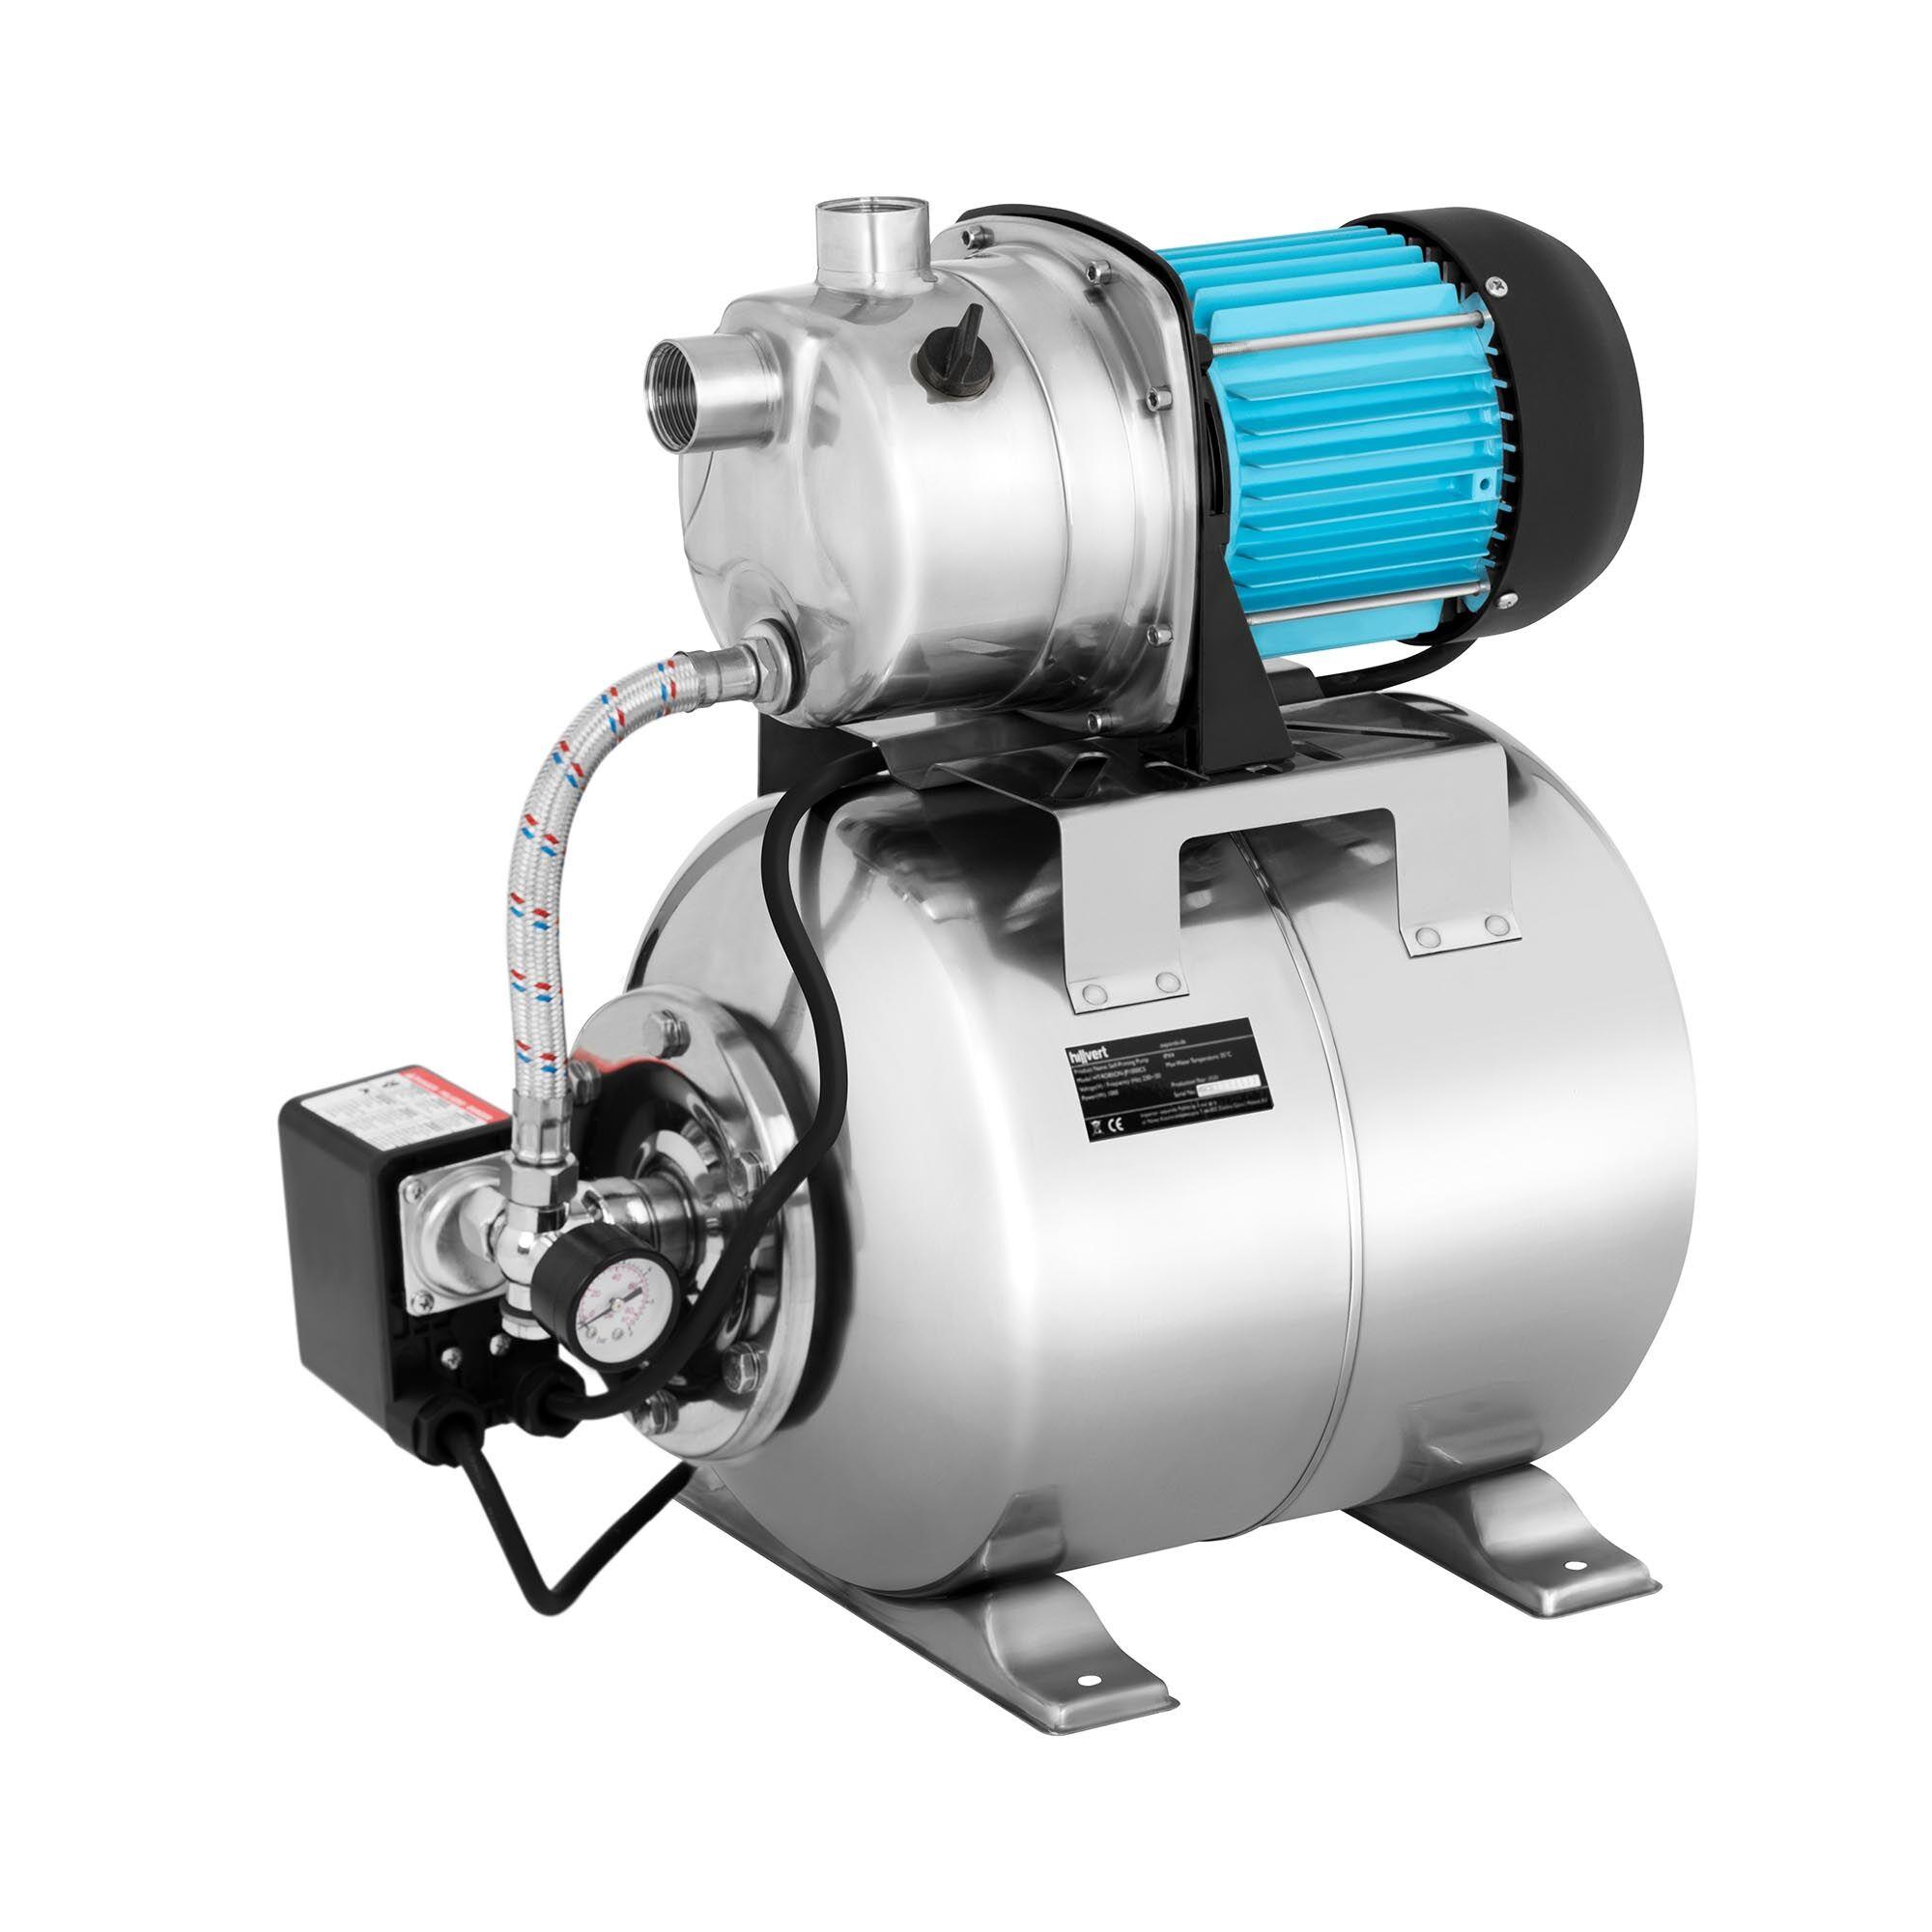 hillvert pompa autoadescante - 3.100 l/h - 1.000 w - acciaio inox ht-robson-jp1000cs